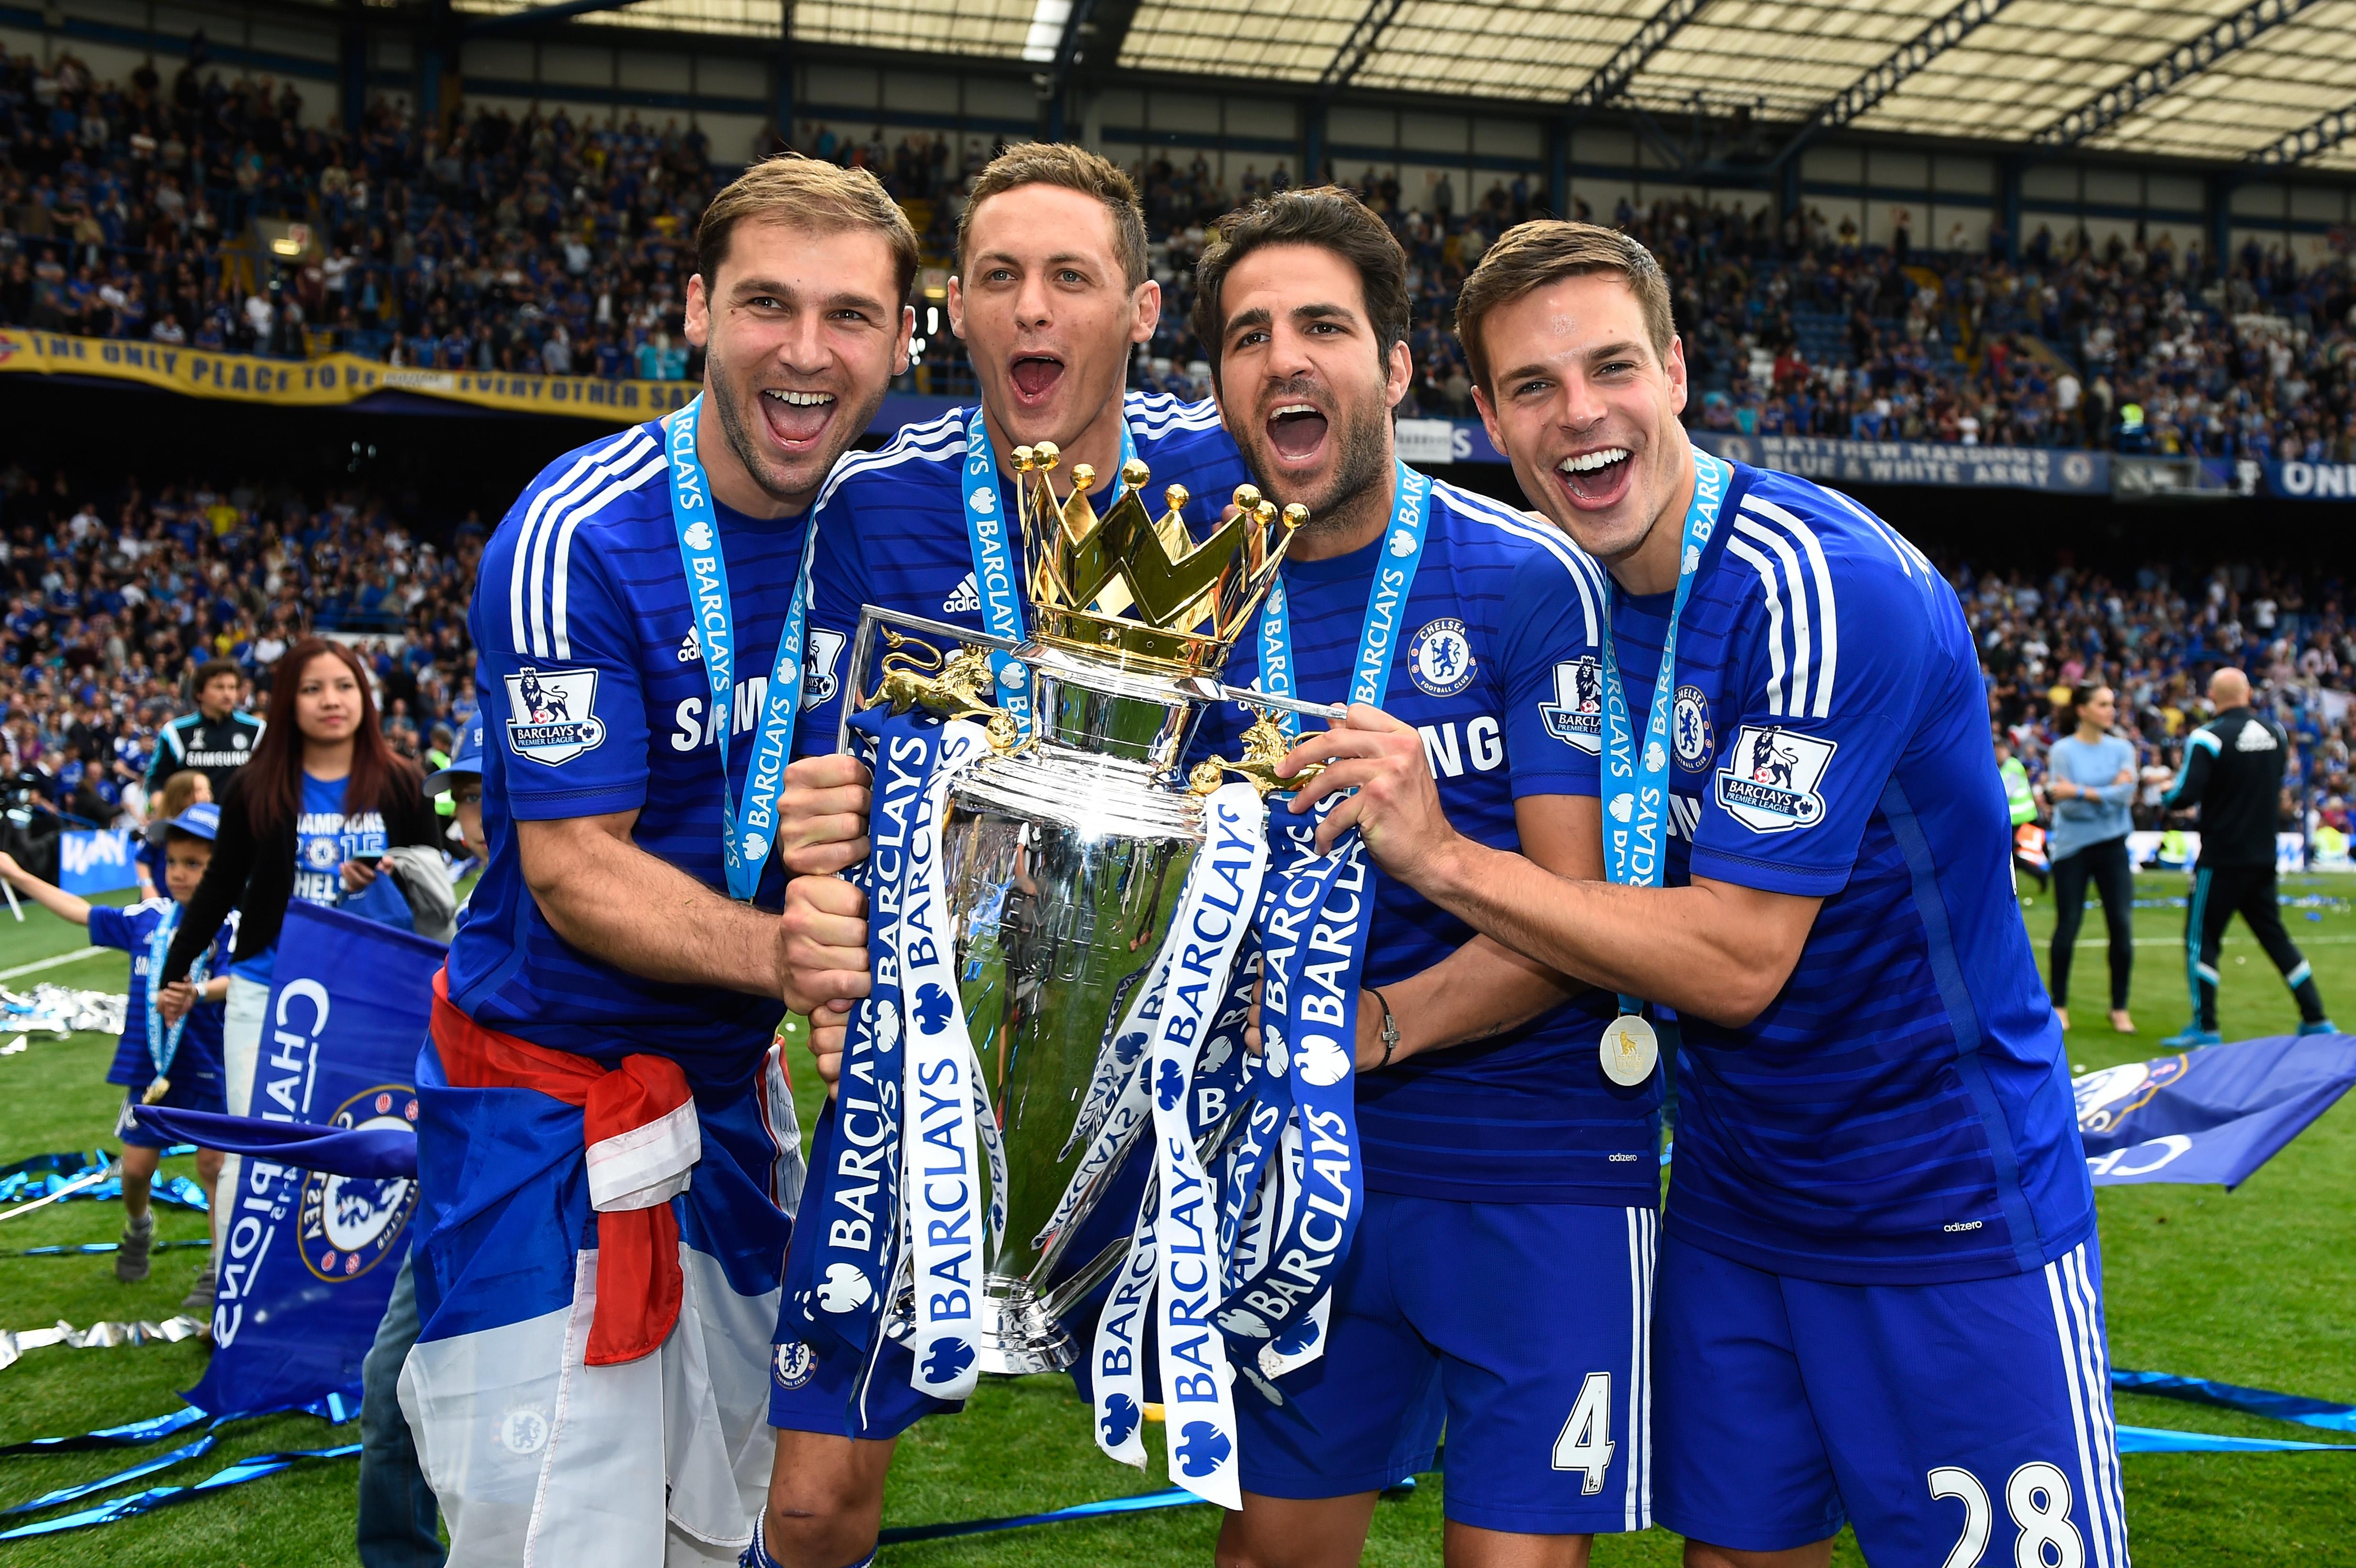 Chelsea post classy tribute to departing defender Branislav Ivanovic